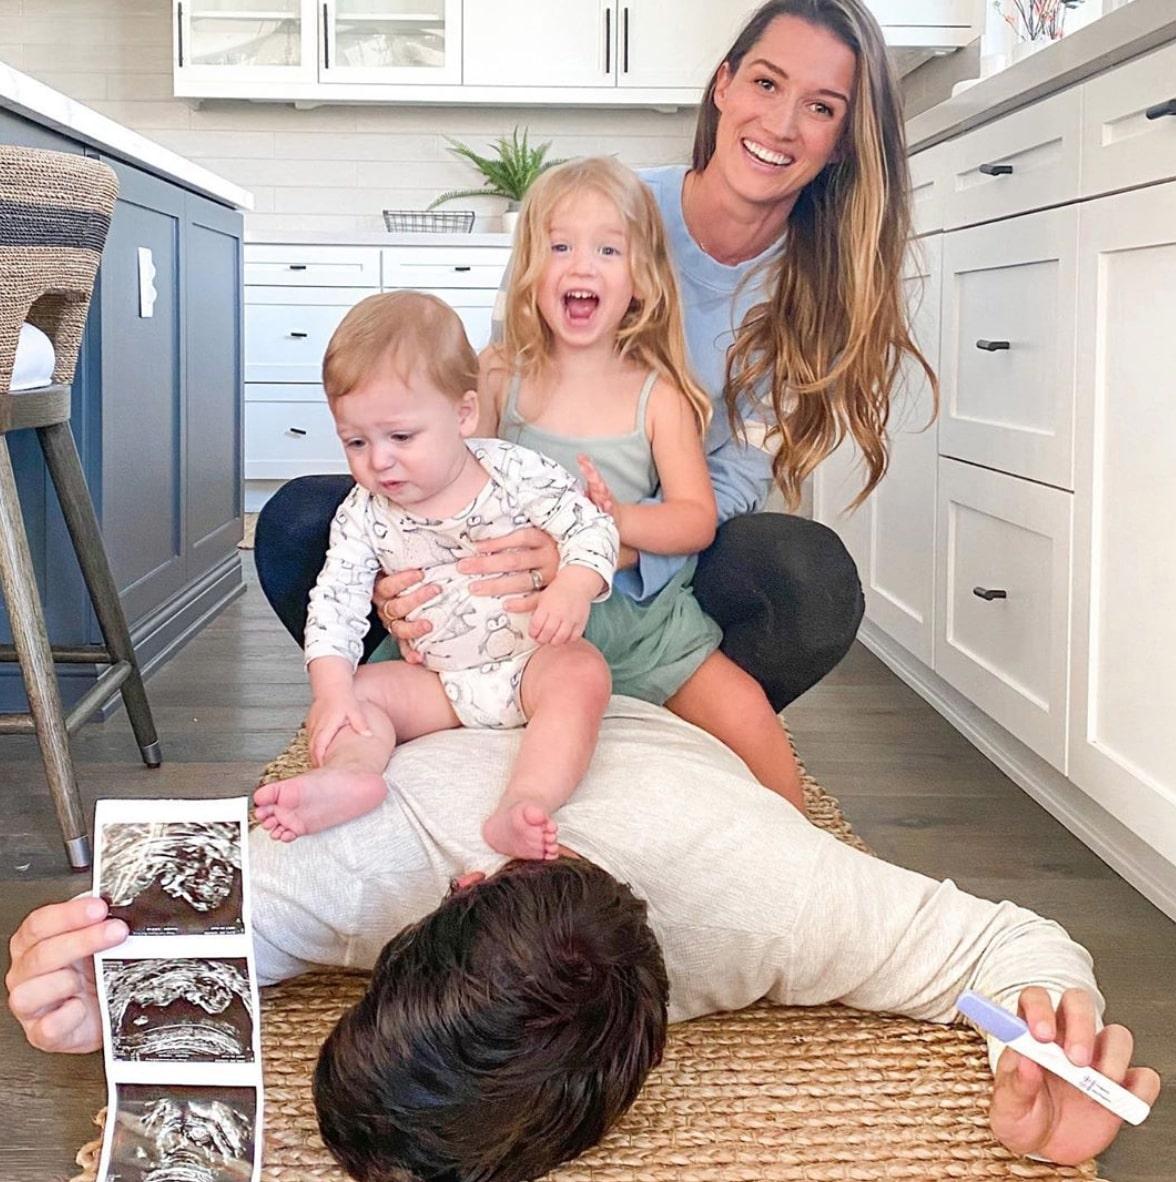 Jade and Tanner Tolbert Reveal Gender of Third Child